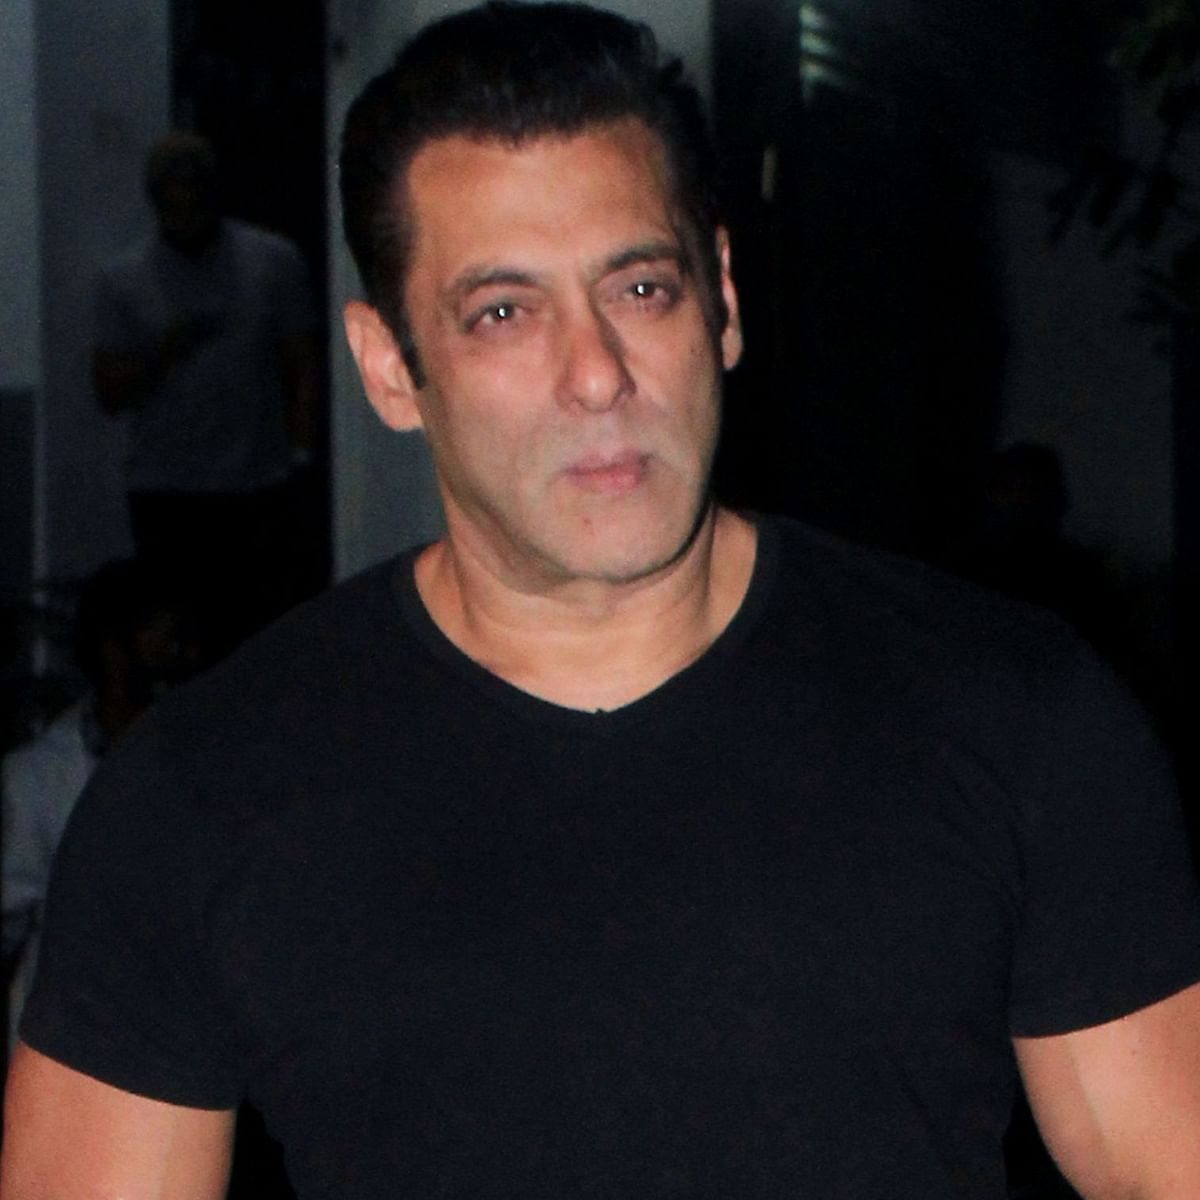 Salman Khan apologises for 'mistakenly' submitting fake affidavit in blackbuck poaching case